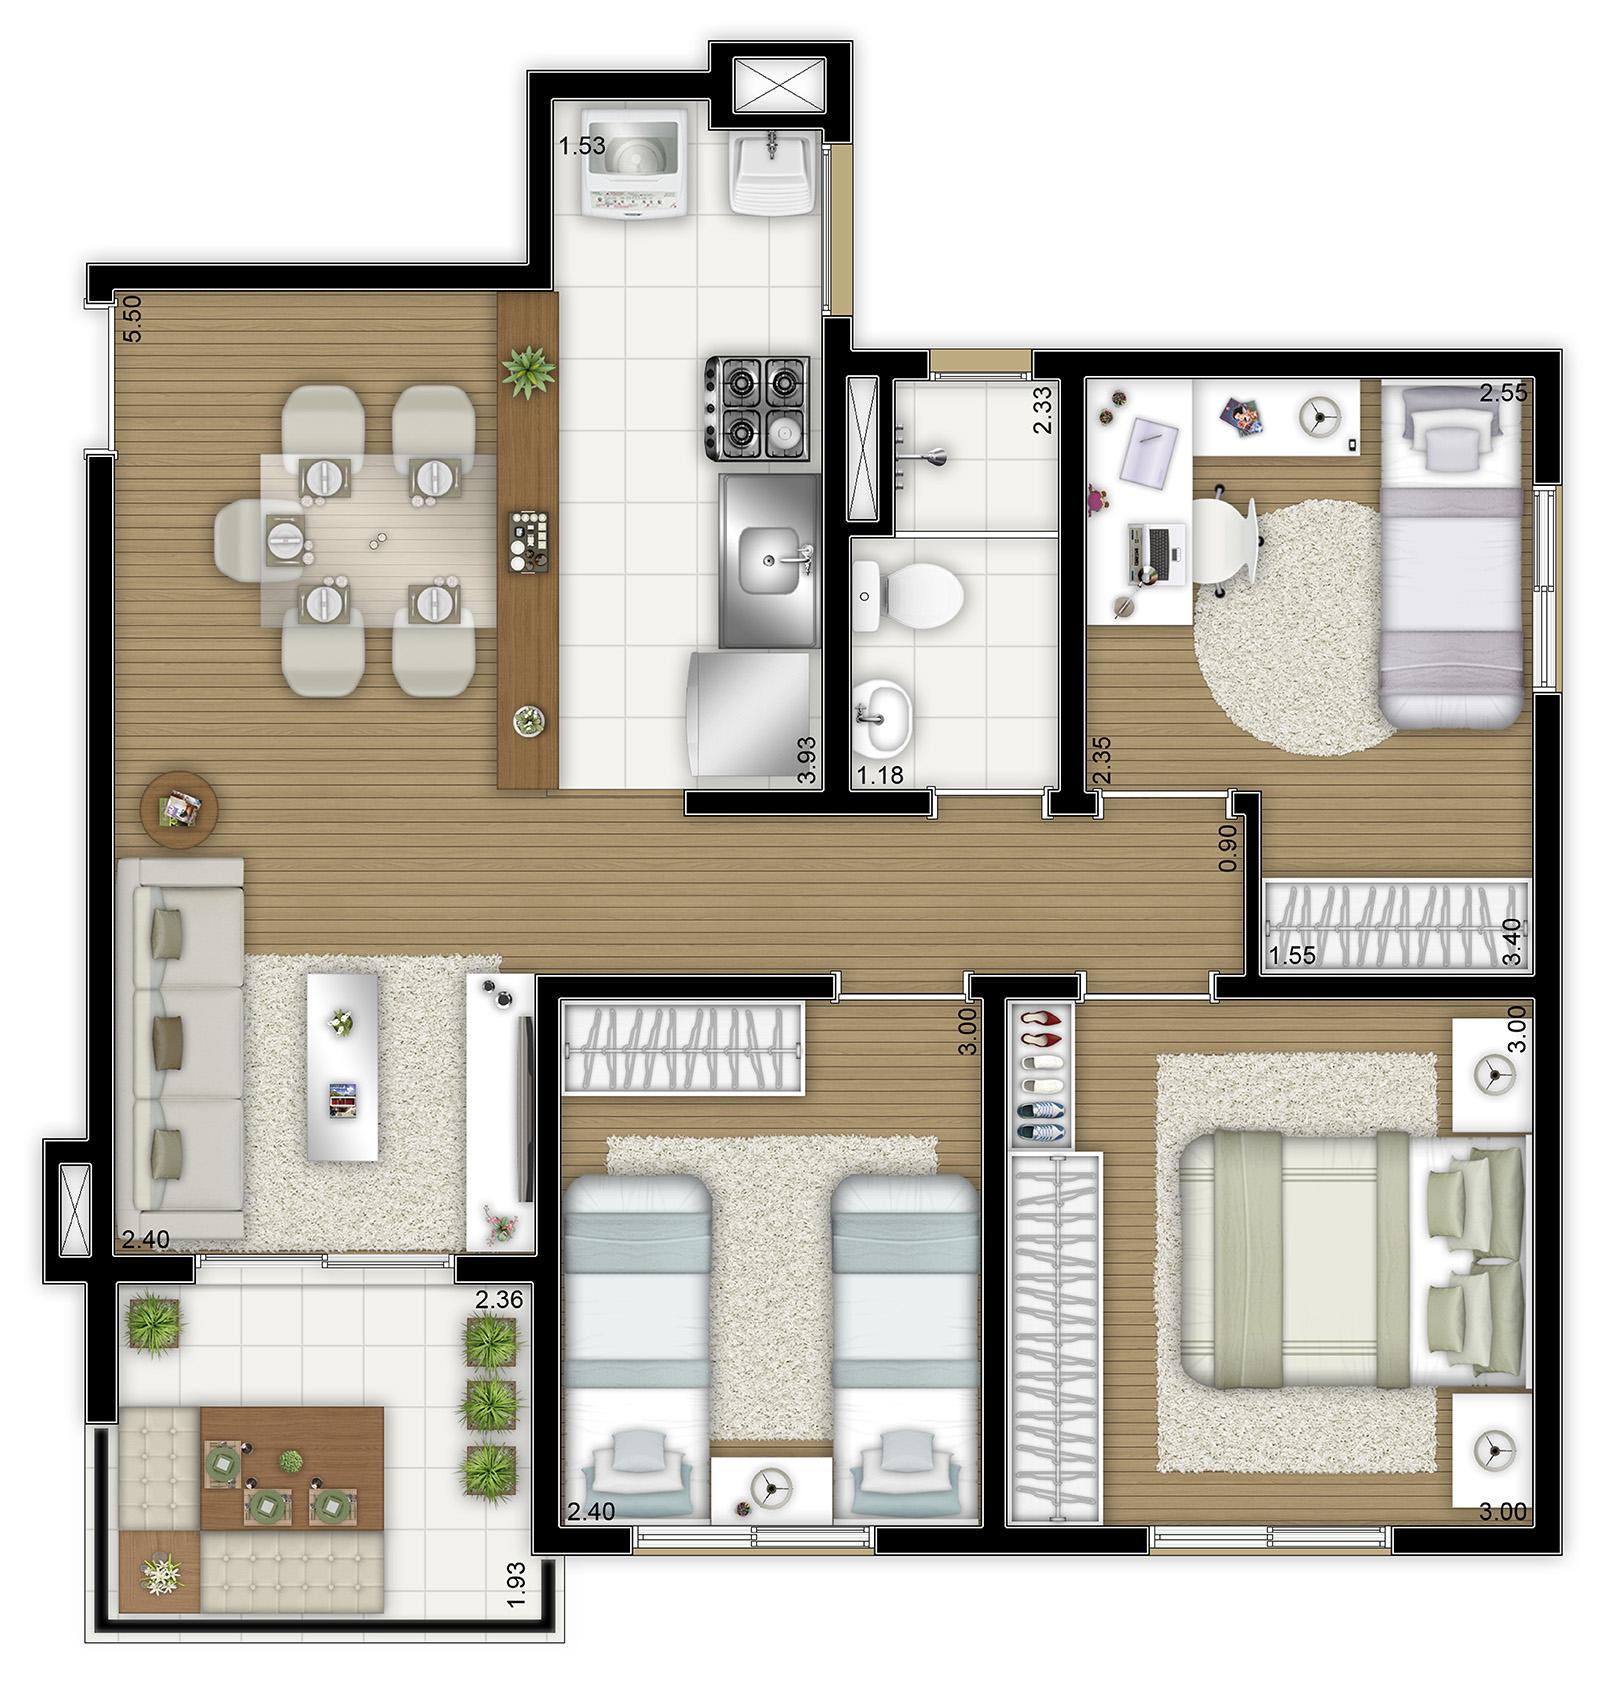 62,83m² - 3 dorms